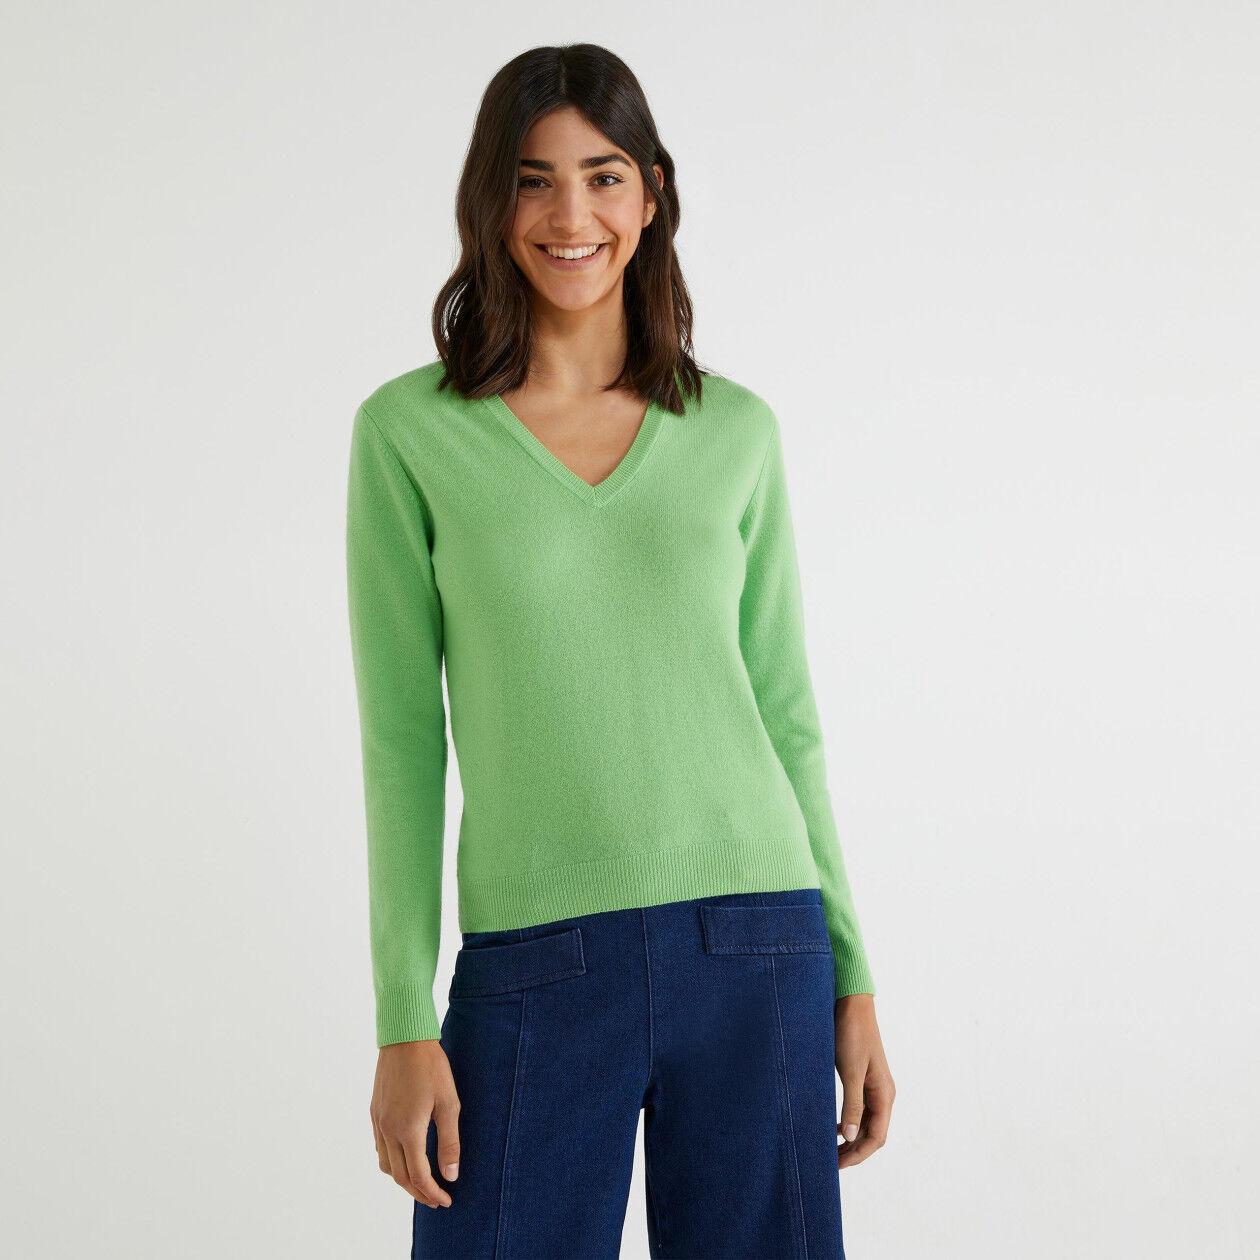 V-neck sweater in 100% virgin wool